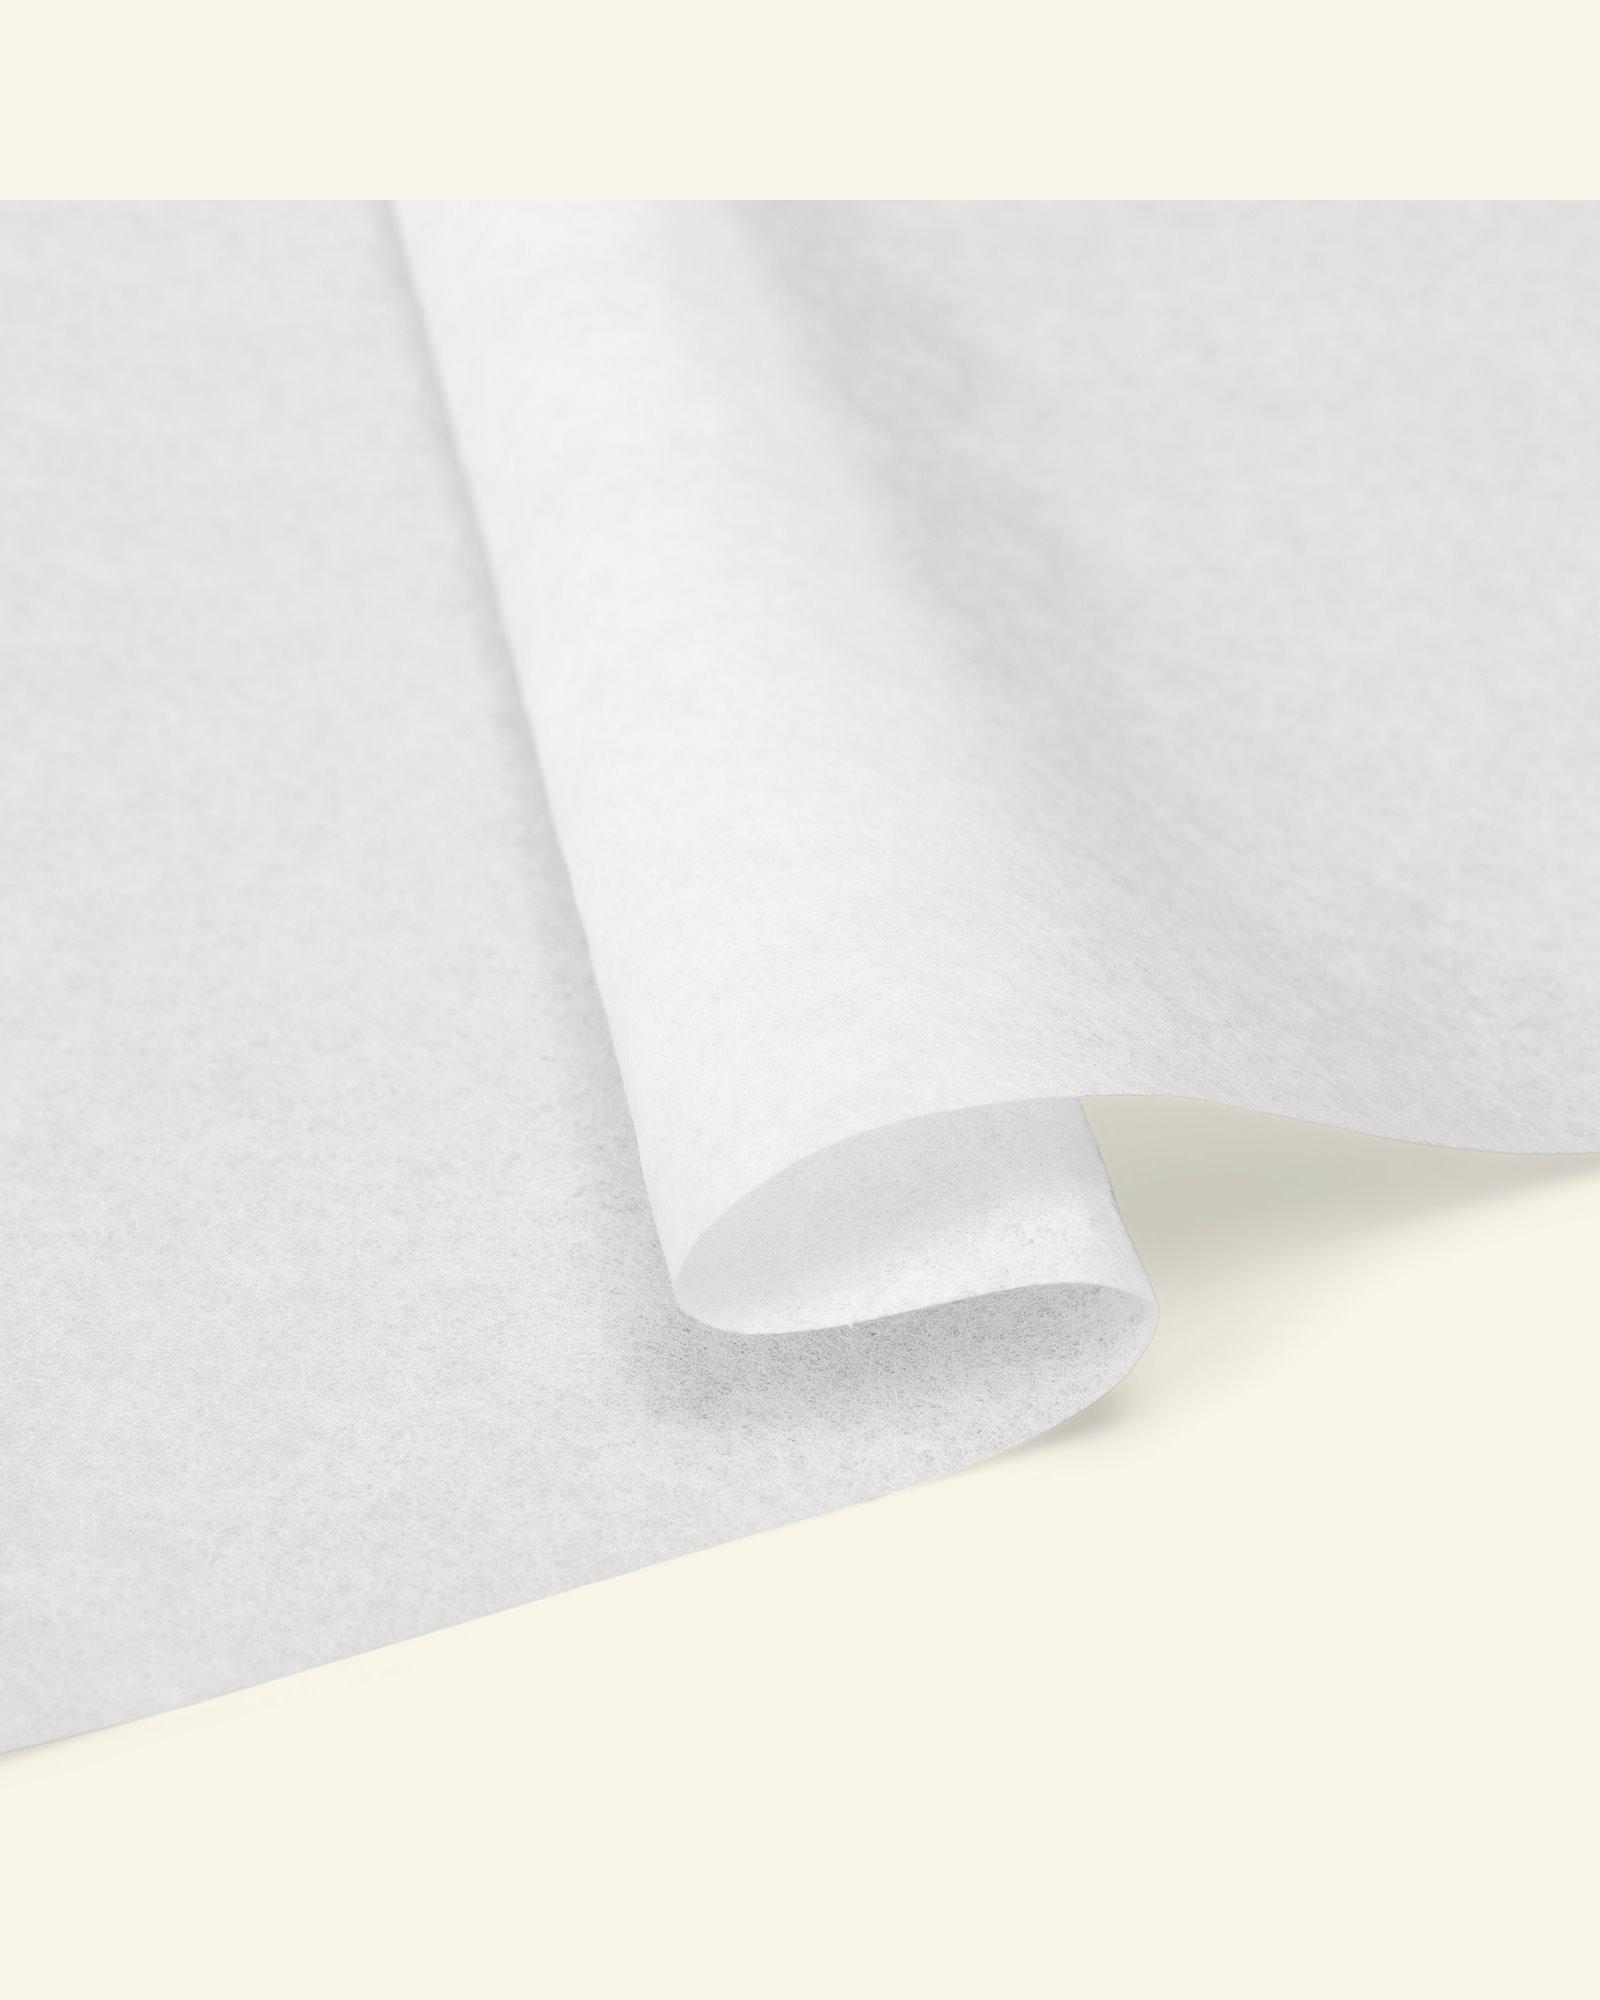 Stable nonwoven interlining white w/glue